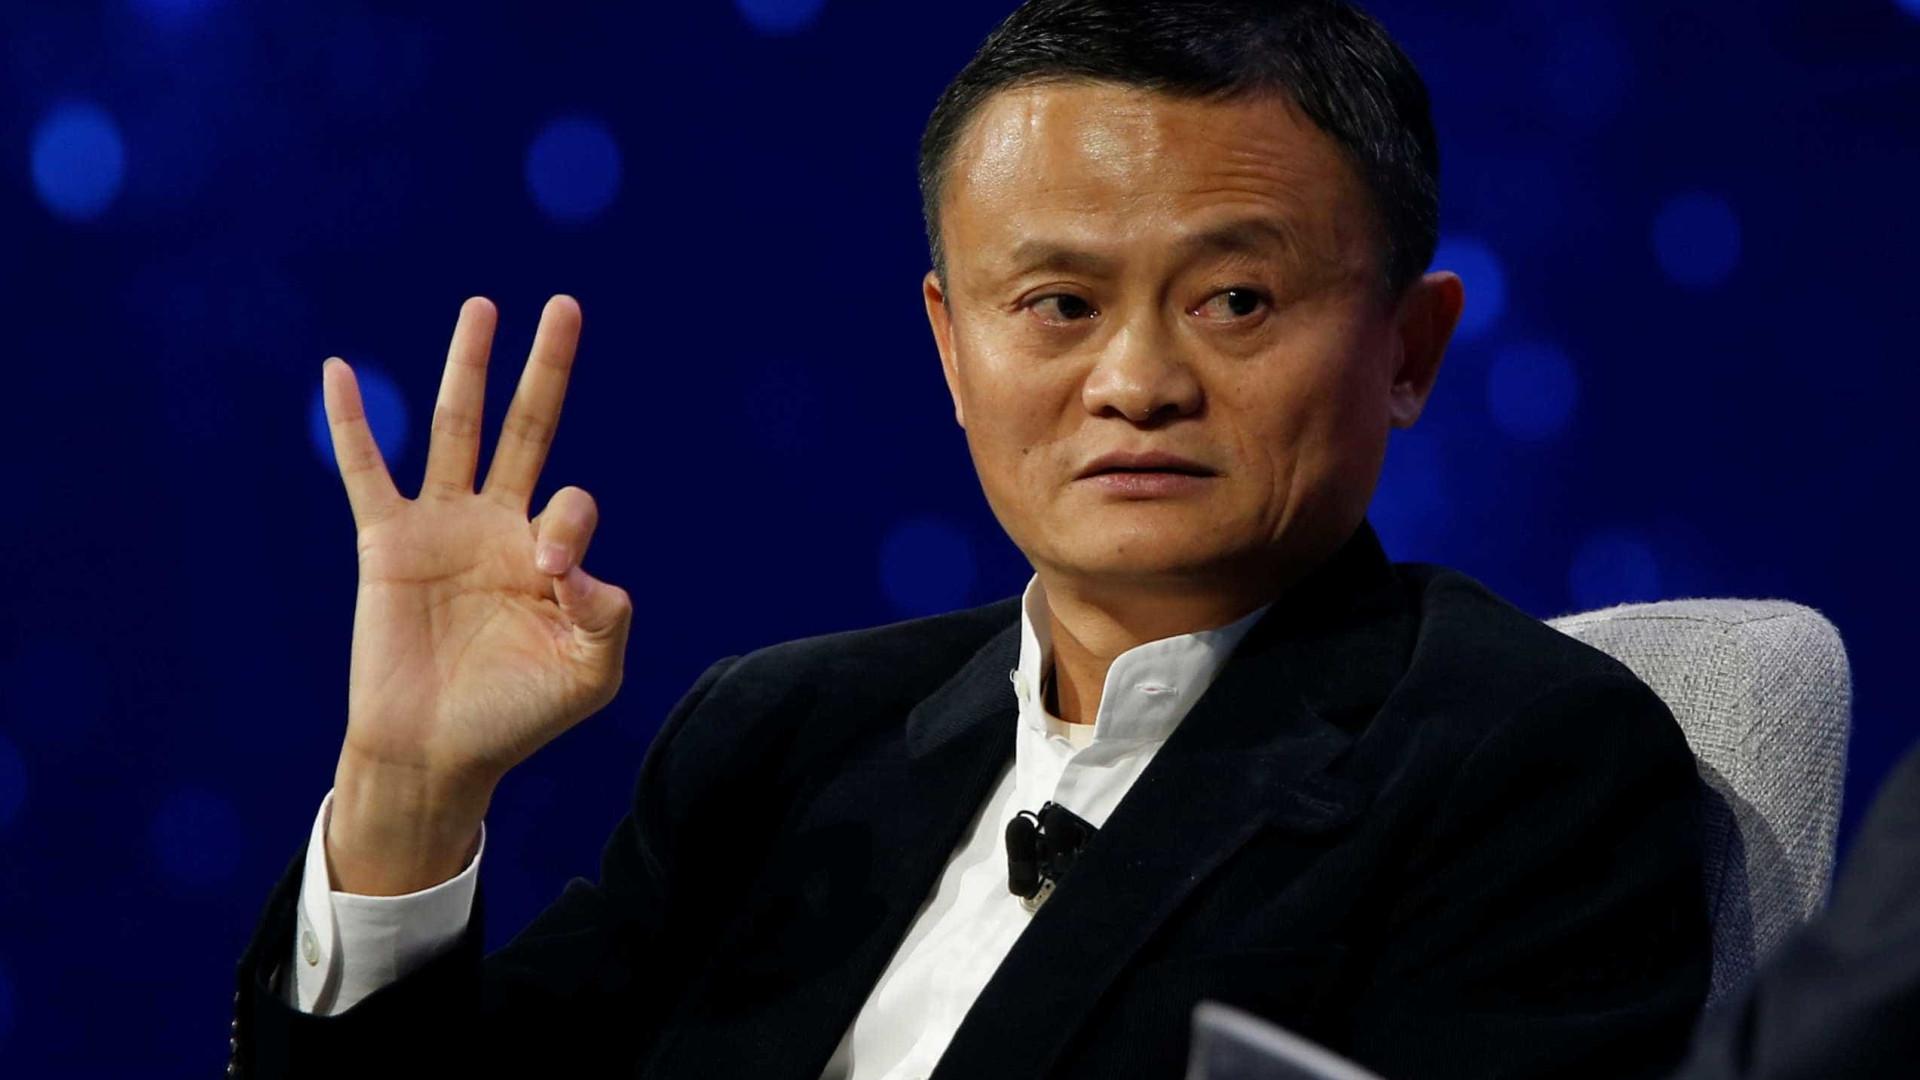 Líder de gigante chinesa quer seguir exemplo de Bill Gates